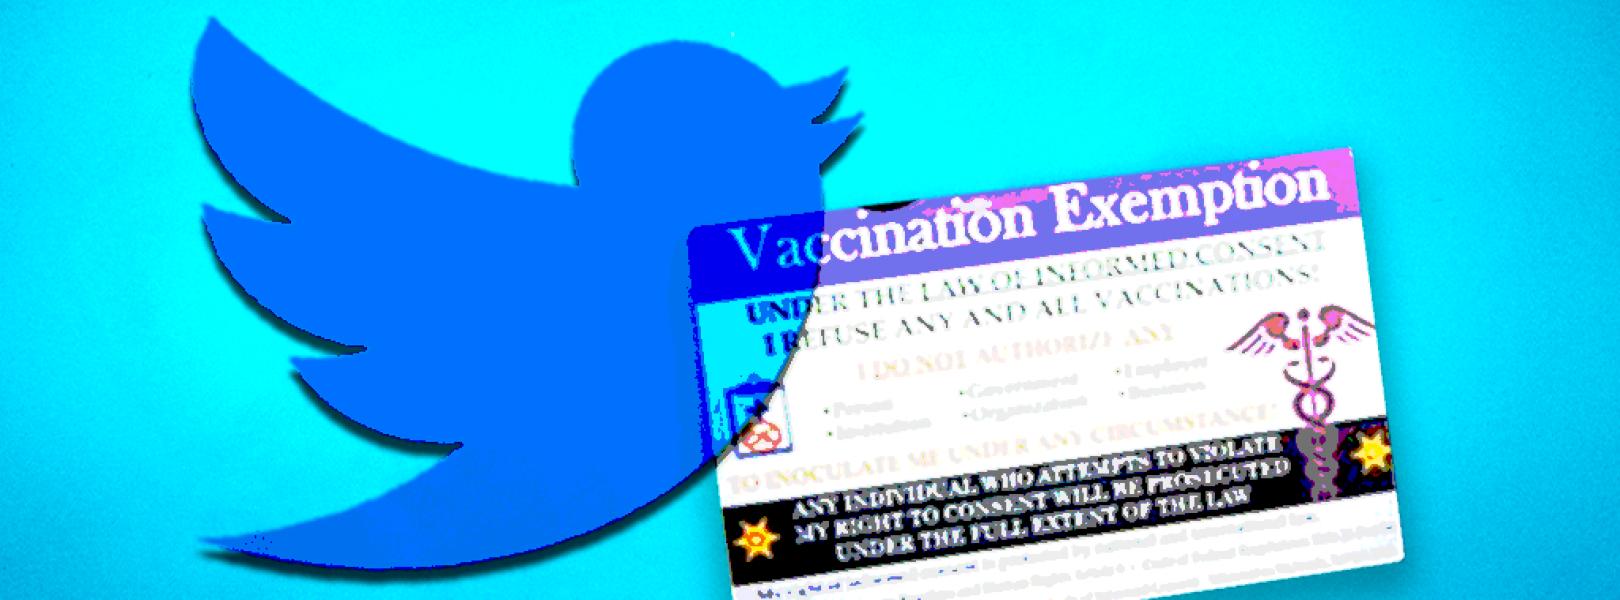 vaccine exemption twitter